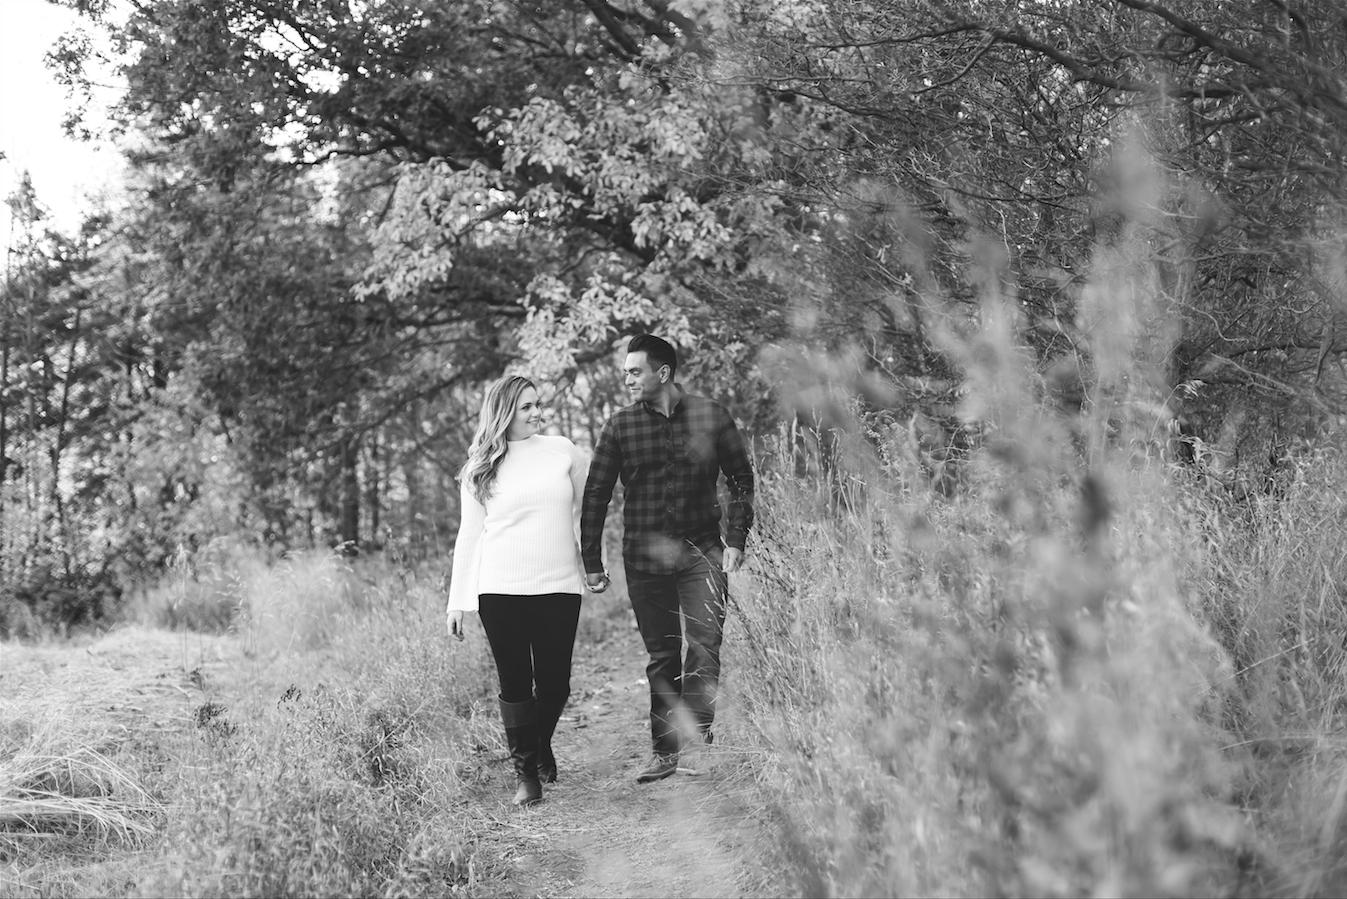 Engagement-Photography-Bruce-Trail-Rain-Hamilton-Burlington-Oakville-Niagara-Toronto-Wedding-Photographer-Photo-Image-2.png